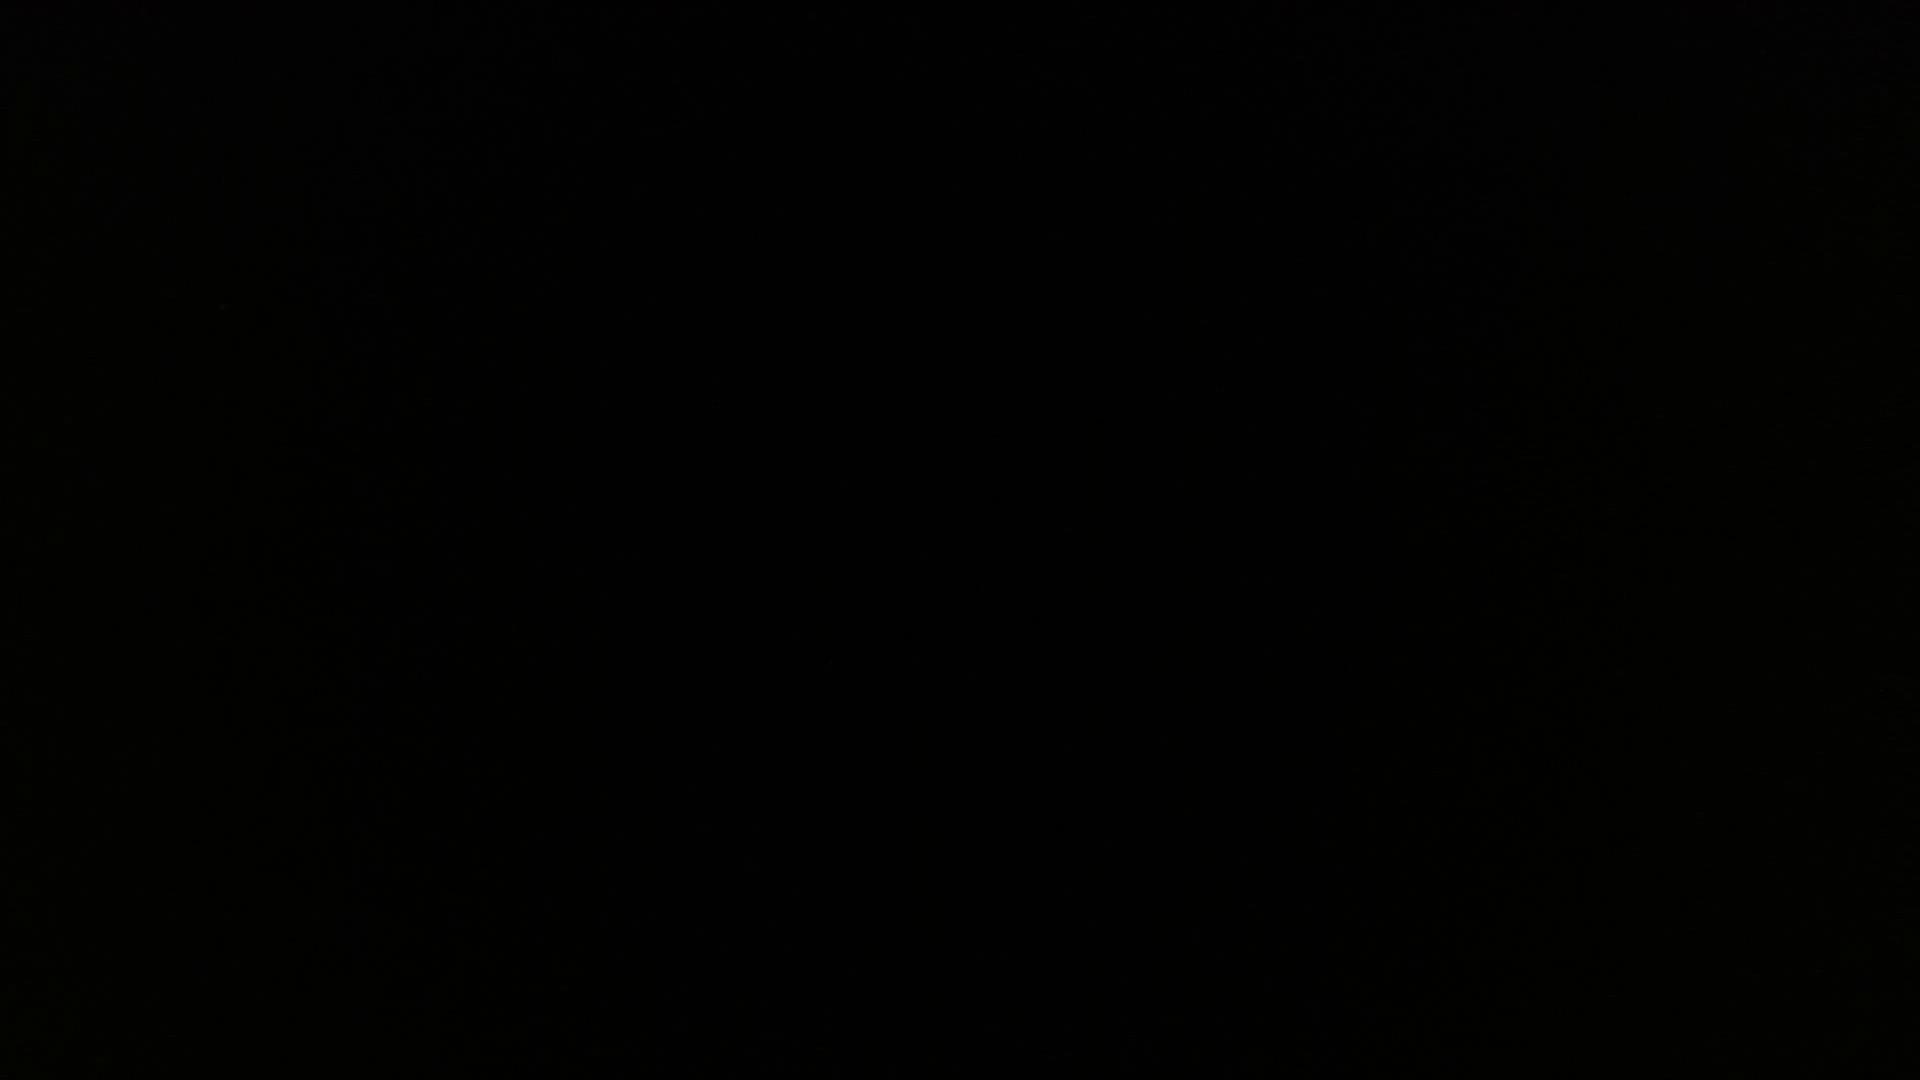 SPYさん初投稿!マンション覗き!5000K!ハイビジョン撮影VOL.03(元野球部社会人編) 完全無修正  109pic 64